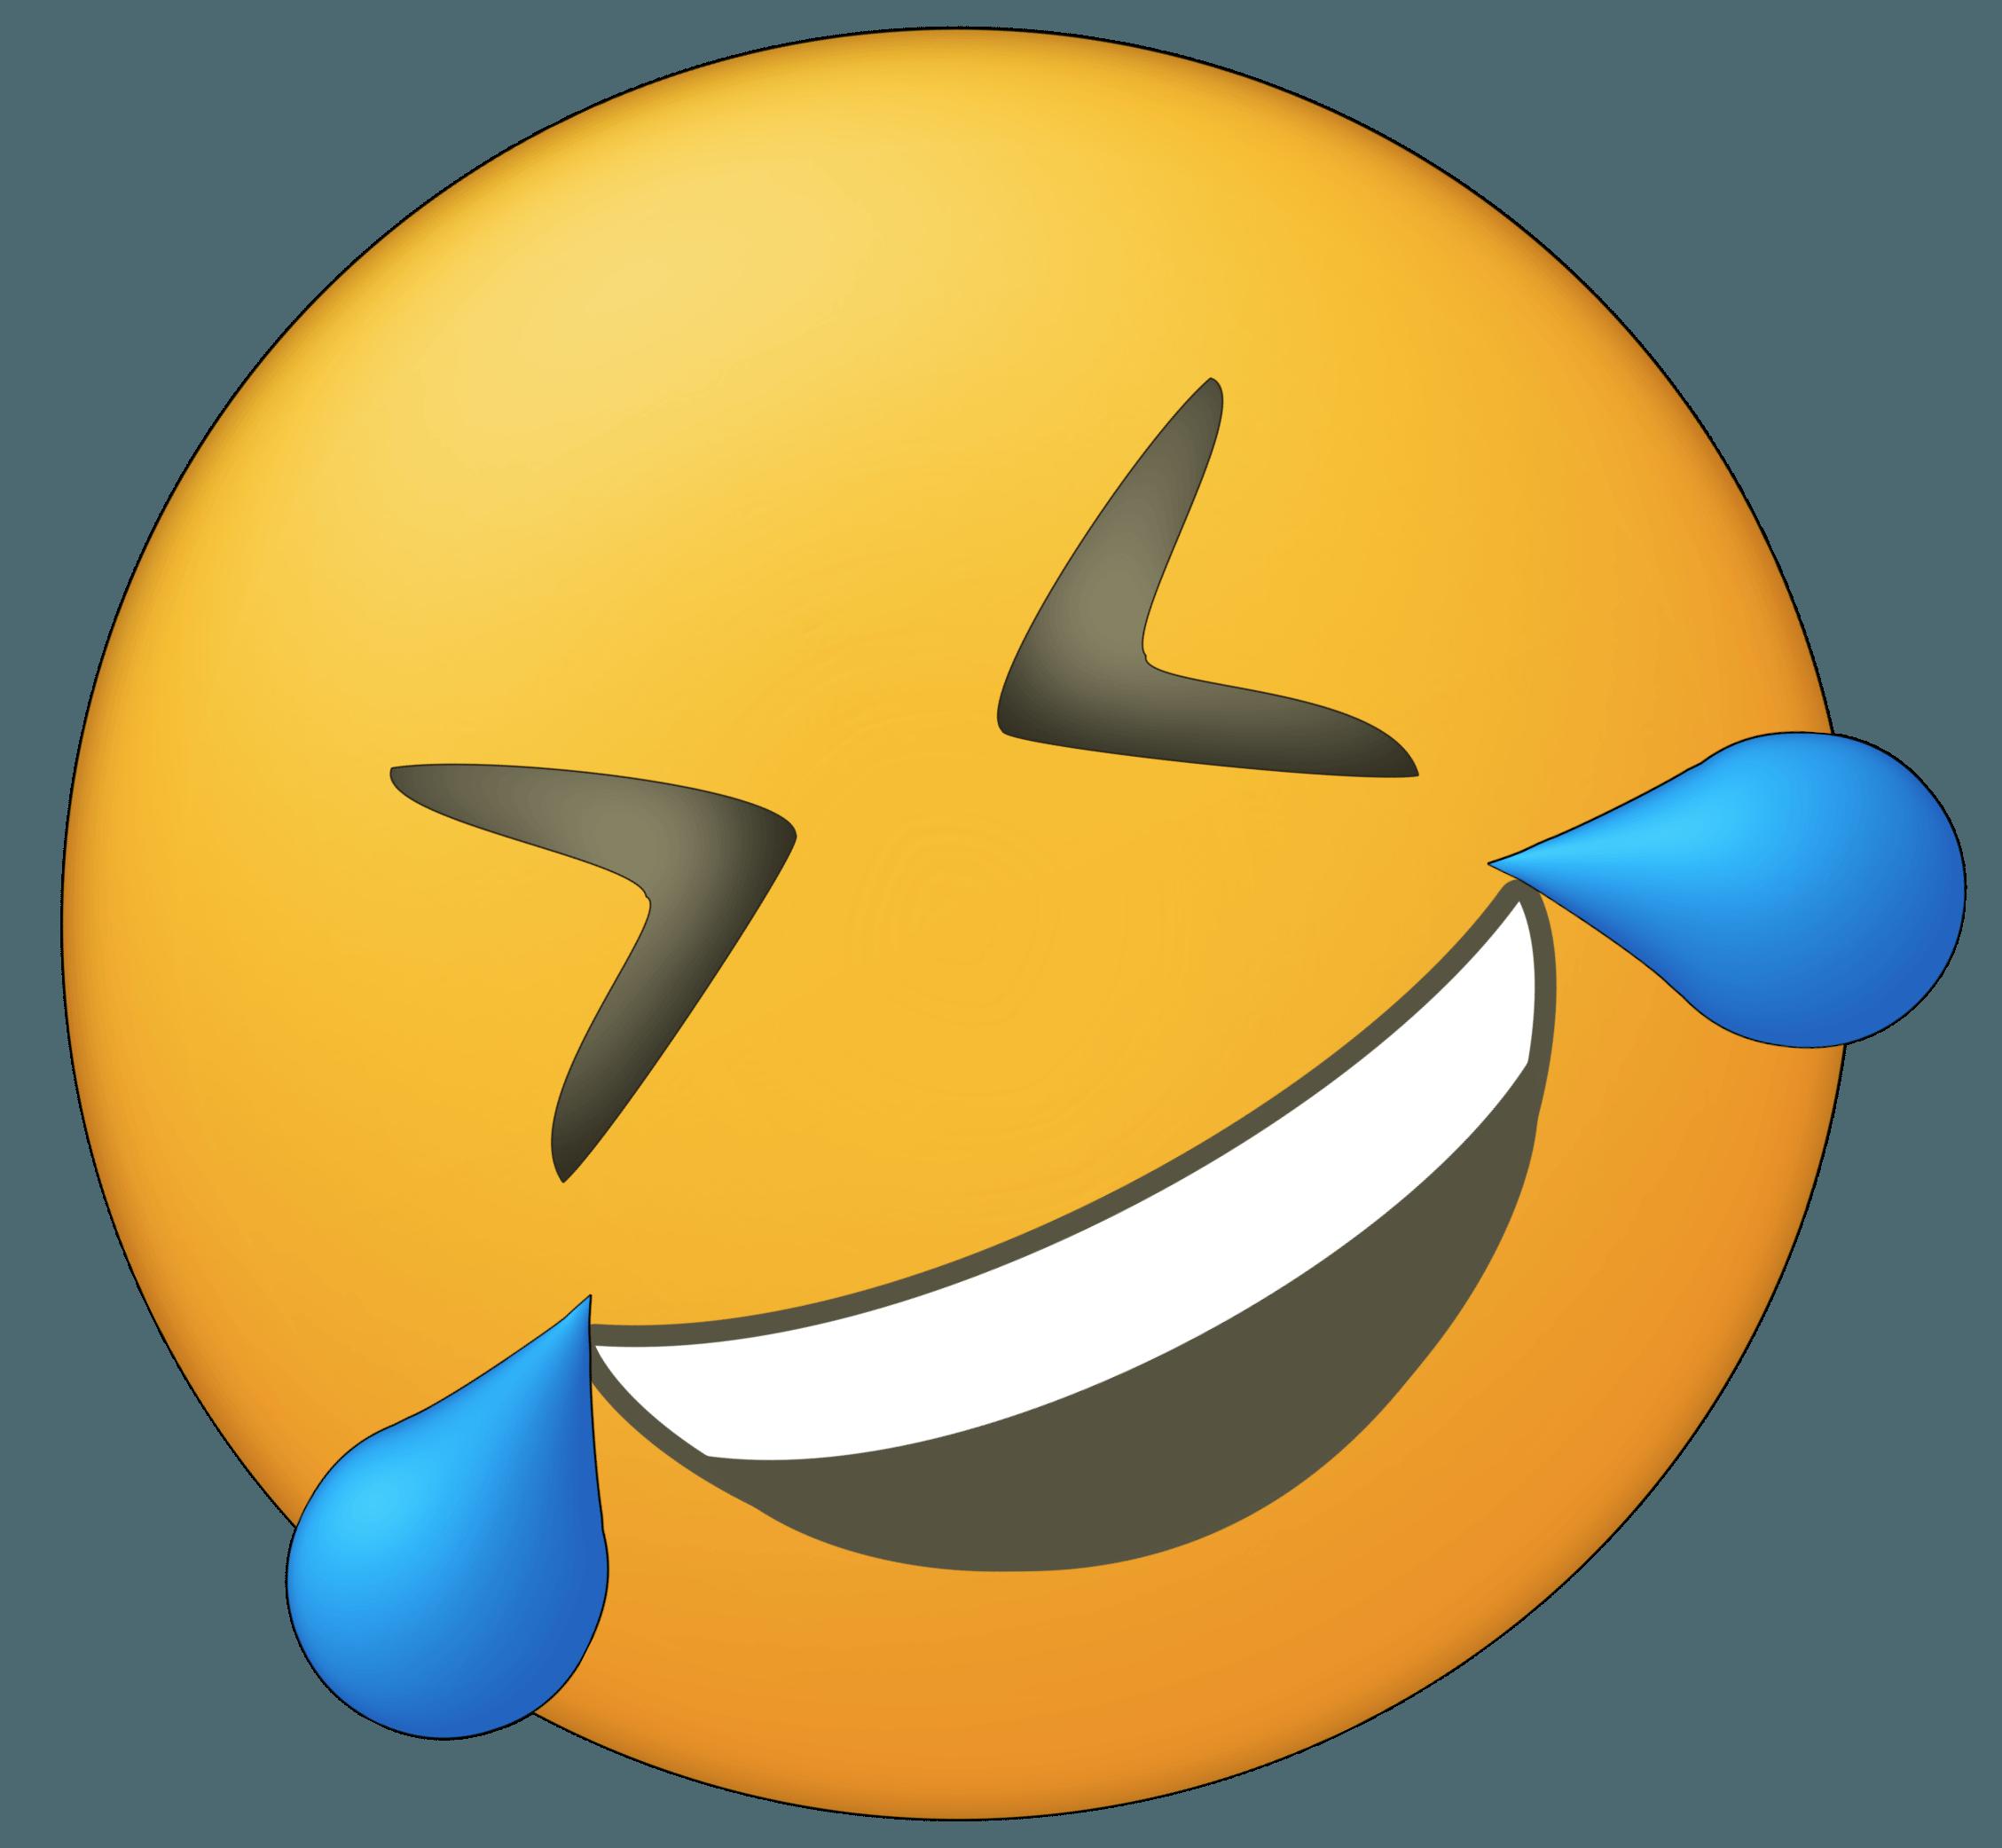 Dyingcryinglaughing.png 2,257×2,083 pixels Emoji